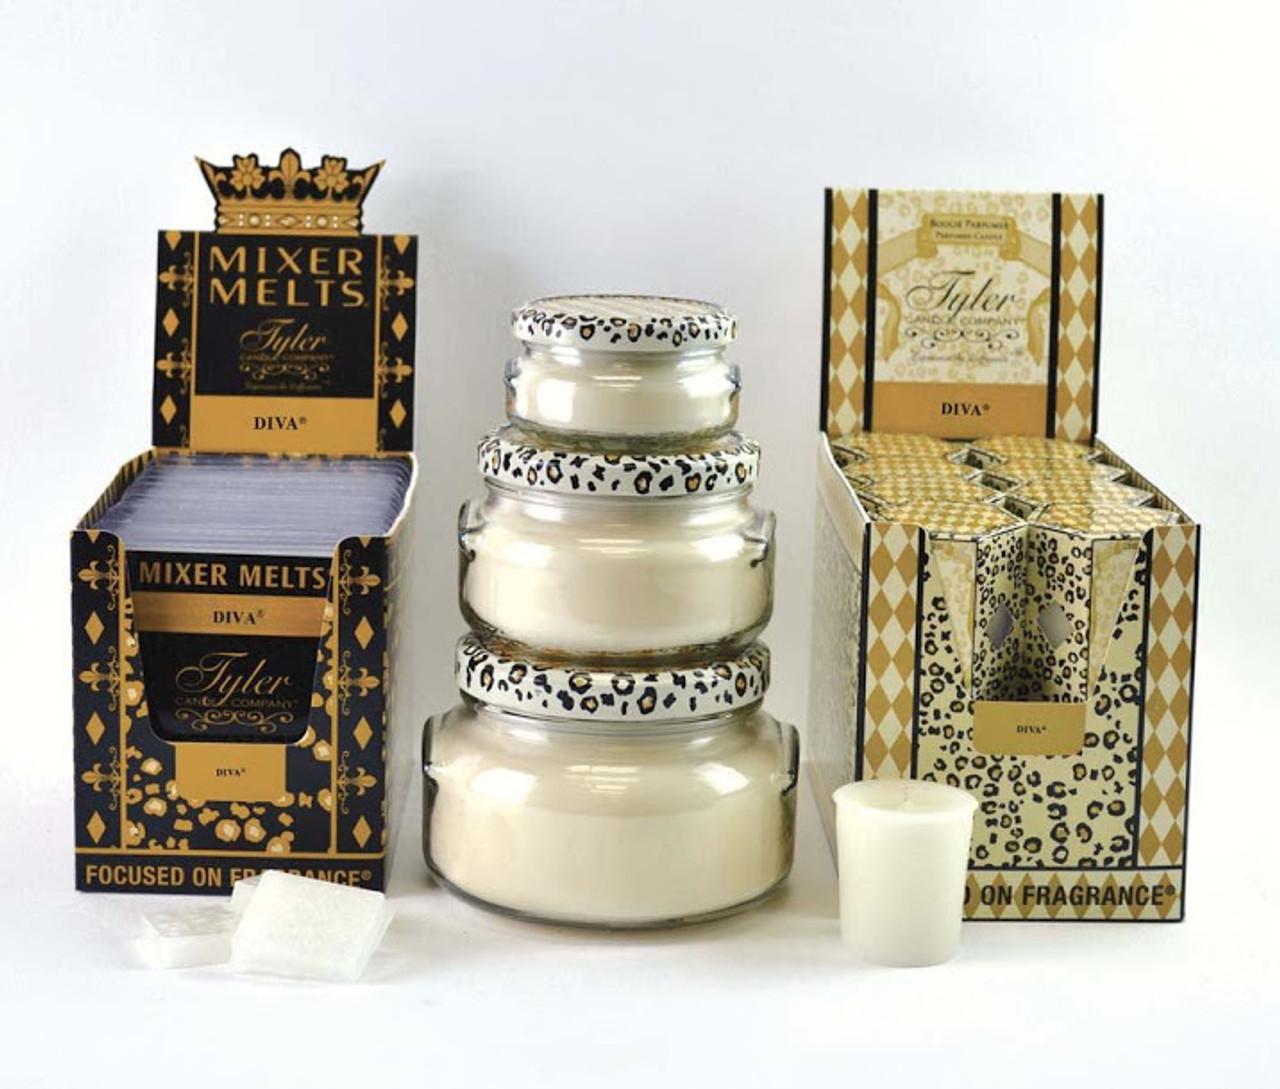 11 oz. DIVA® Tyler Candle Company